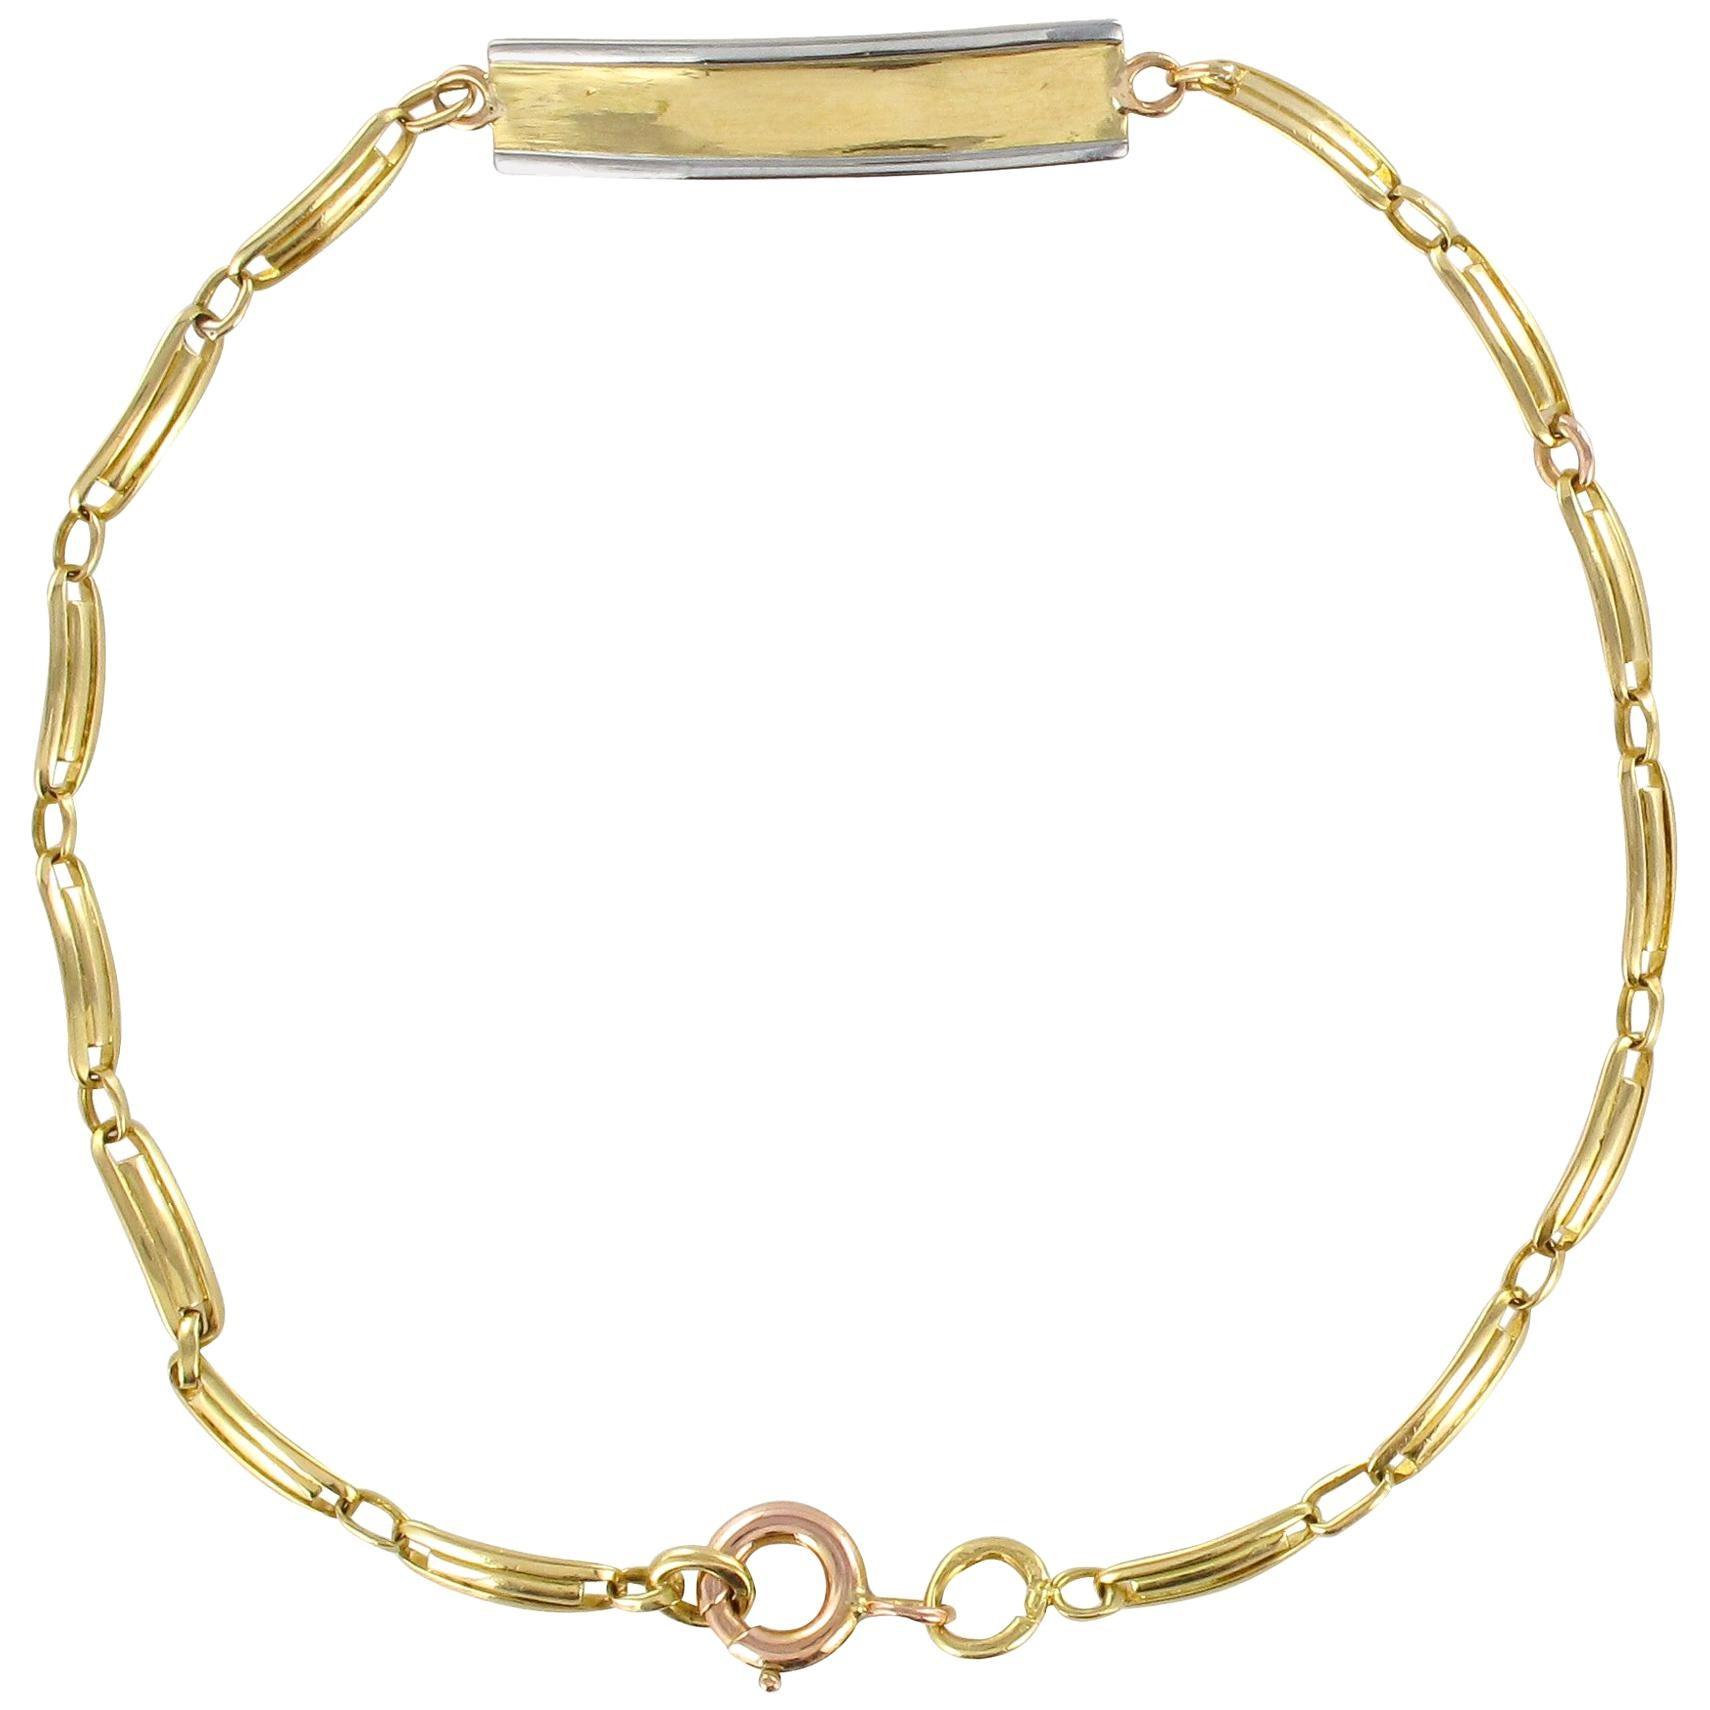 French 1900s 18 Karat Yellow Gold Baby Curb Bracelet